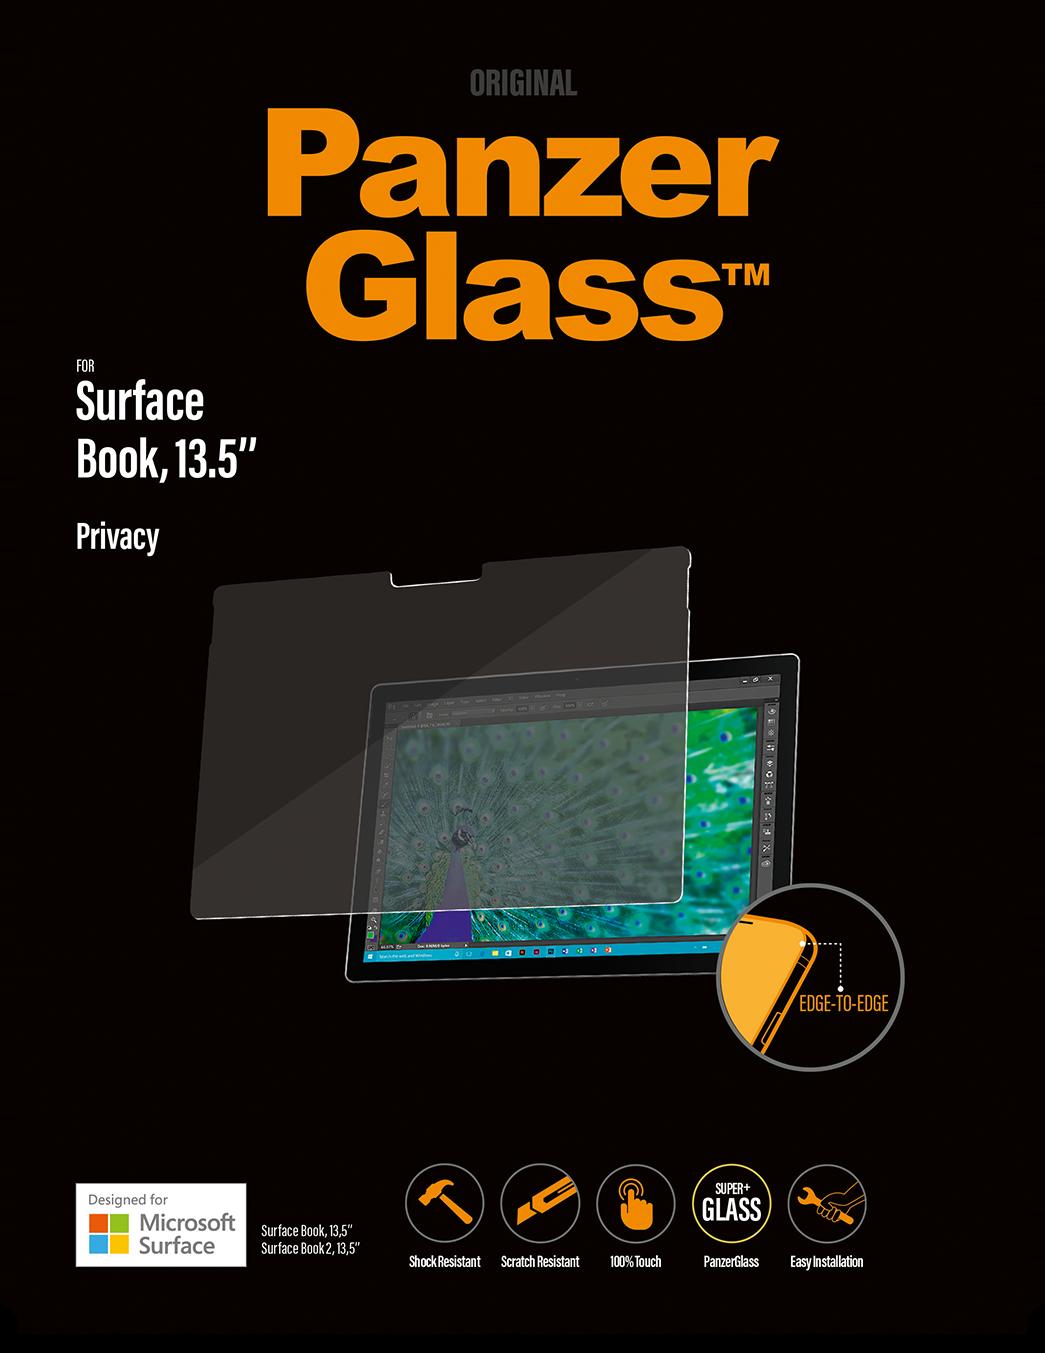 PanzerGlass Surface Book (13.5 インチ) プライバシー スクリーン プロテクター(PanzerGlass)格安通販まとめ